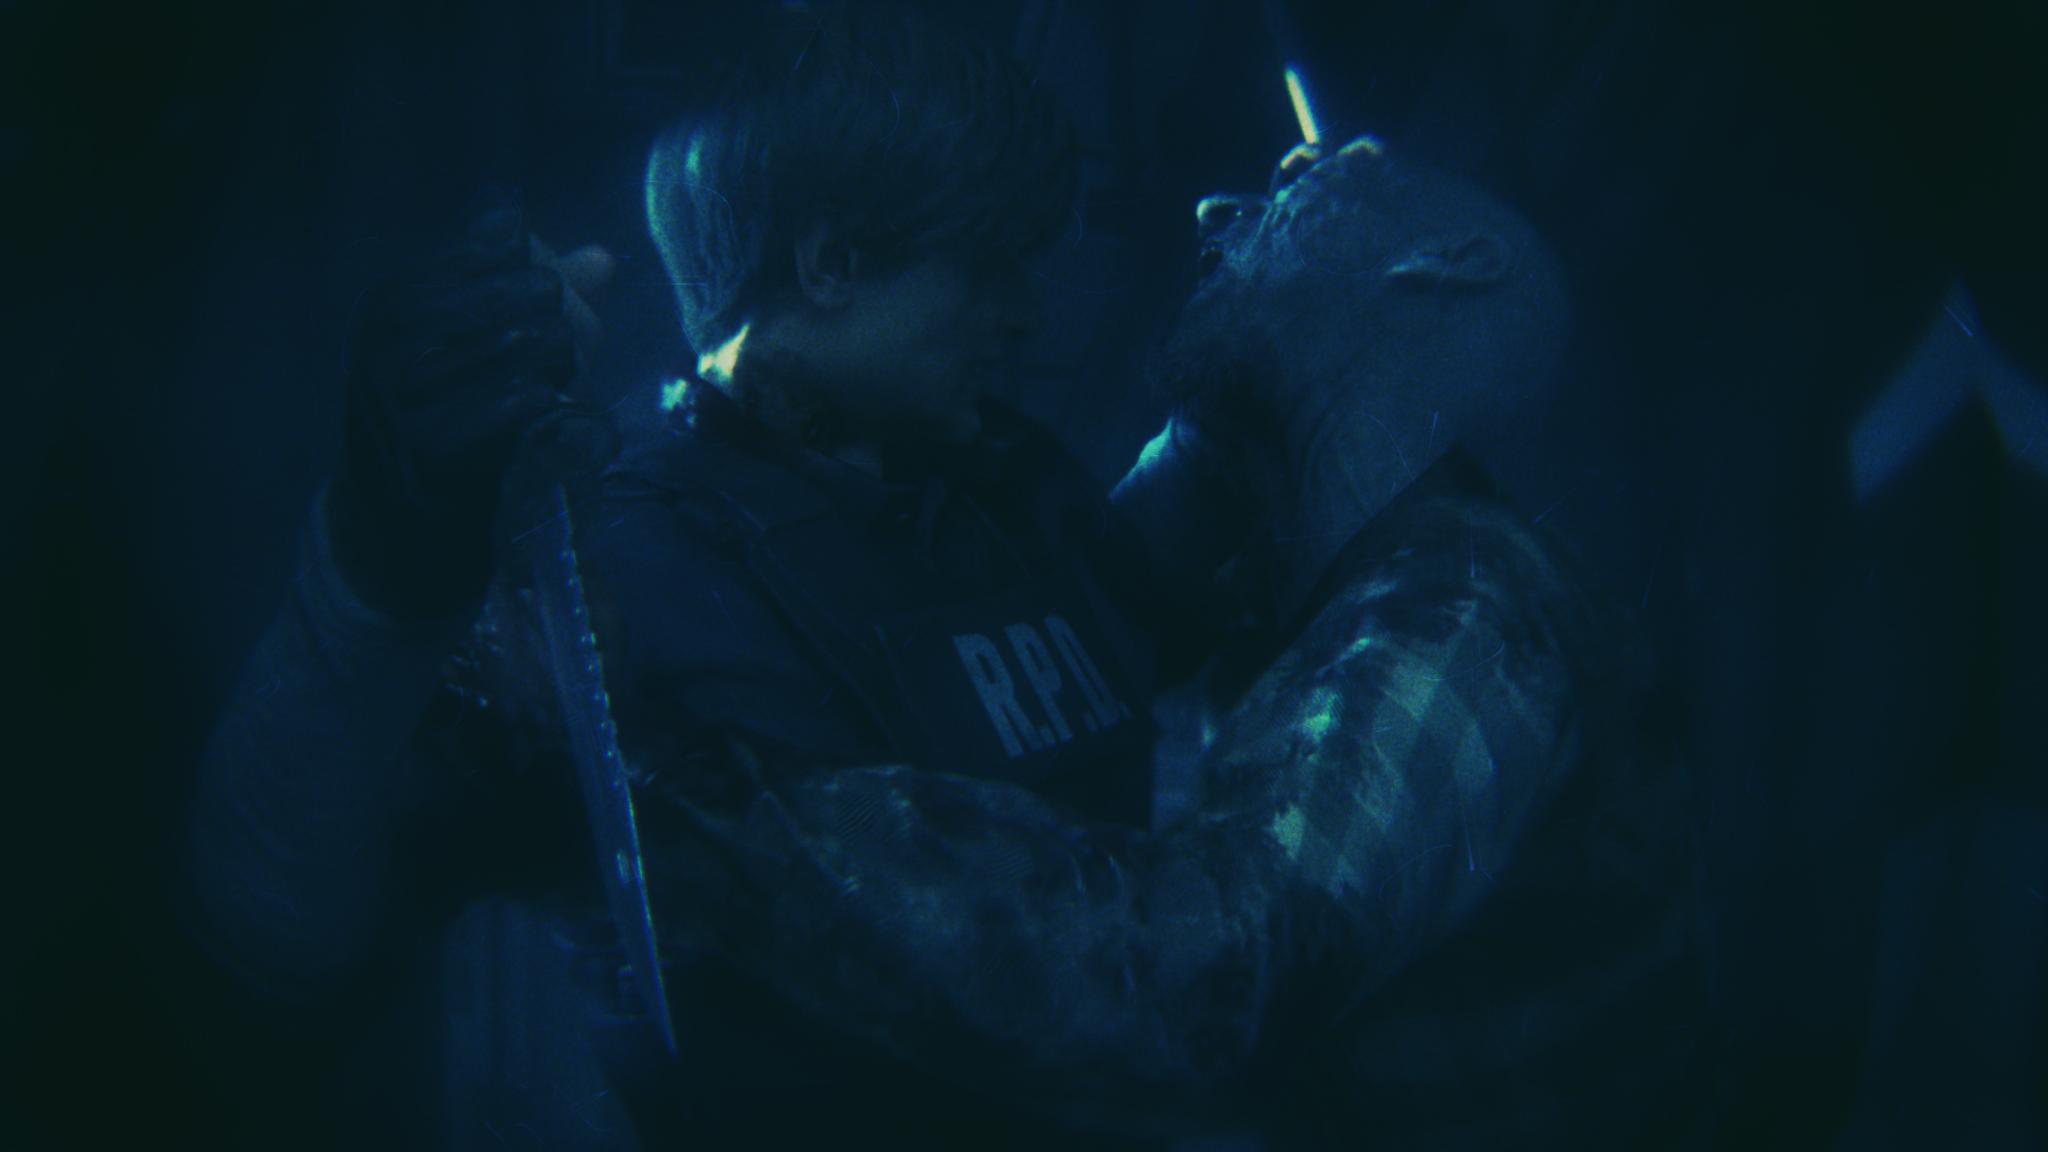 Resident Evil 2 2019 Hd Wallpaper Background Image